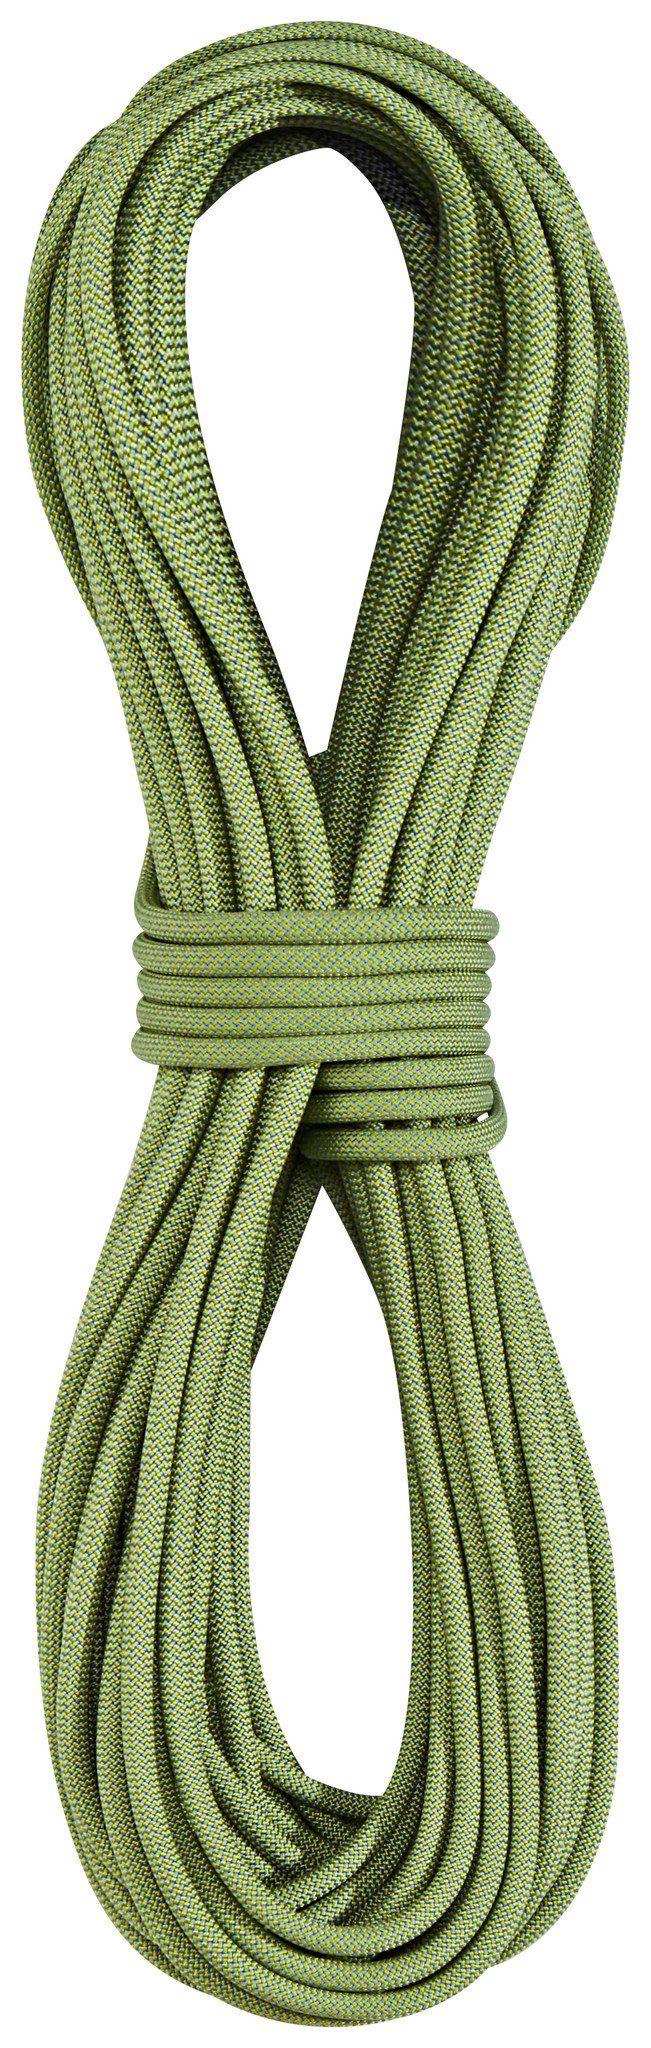 Edelrid Kletterseil »Skimmer Pro Dry Rope 7,1mm 50m«